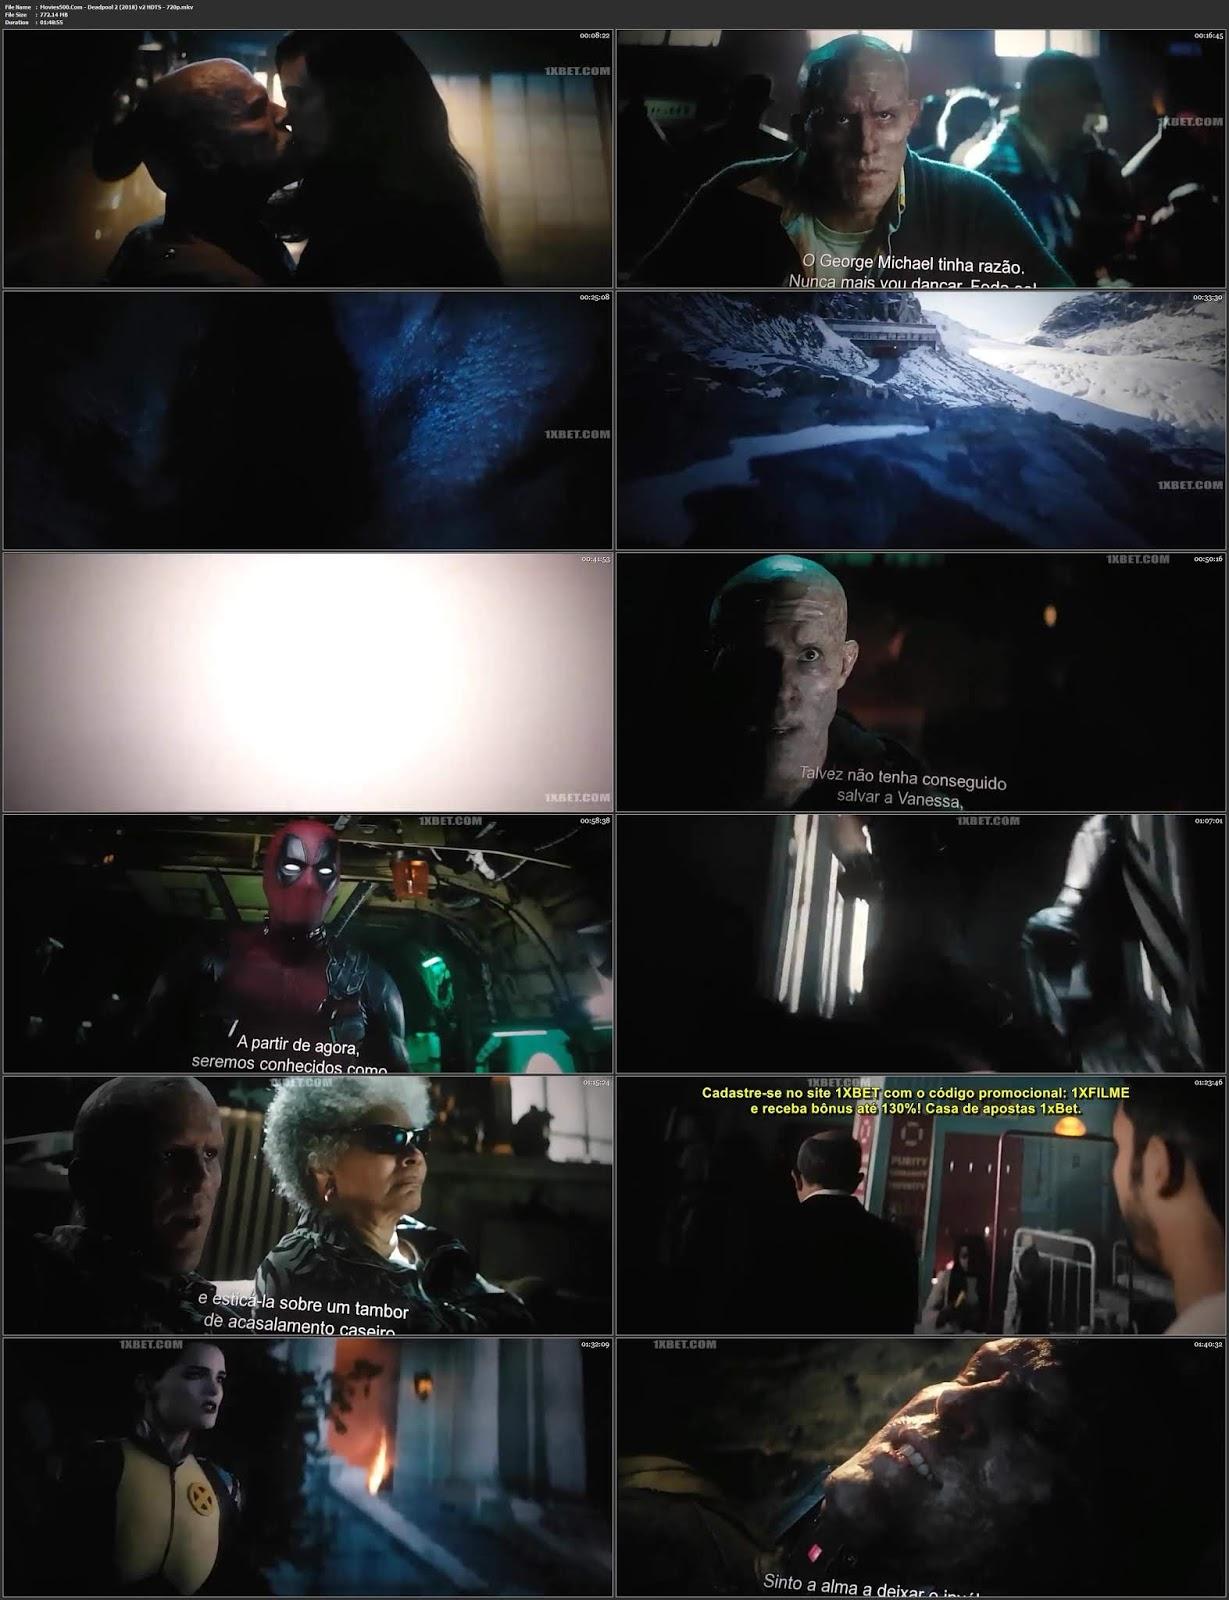 Deadpool2 2018 Hindi Dubbed 300MB V2 HDTS 480p